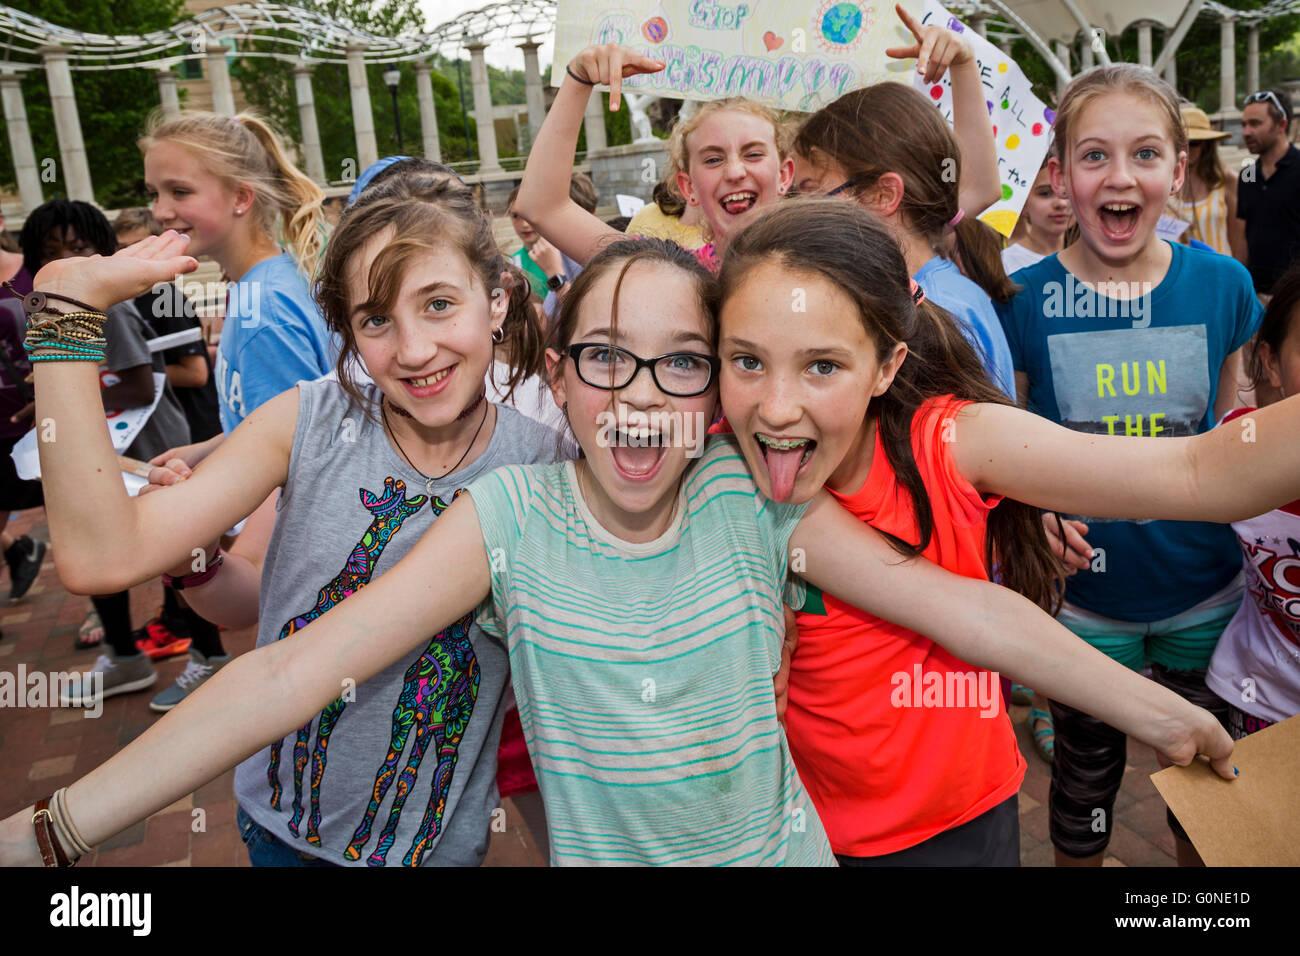 Asheville, North Carolina - Public school students from Isaac Dickson Elementary School. - Stock Image